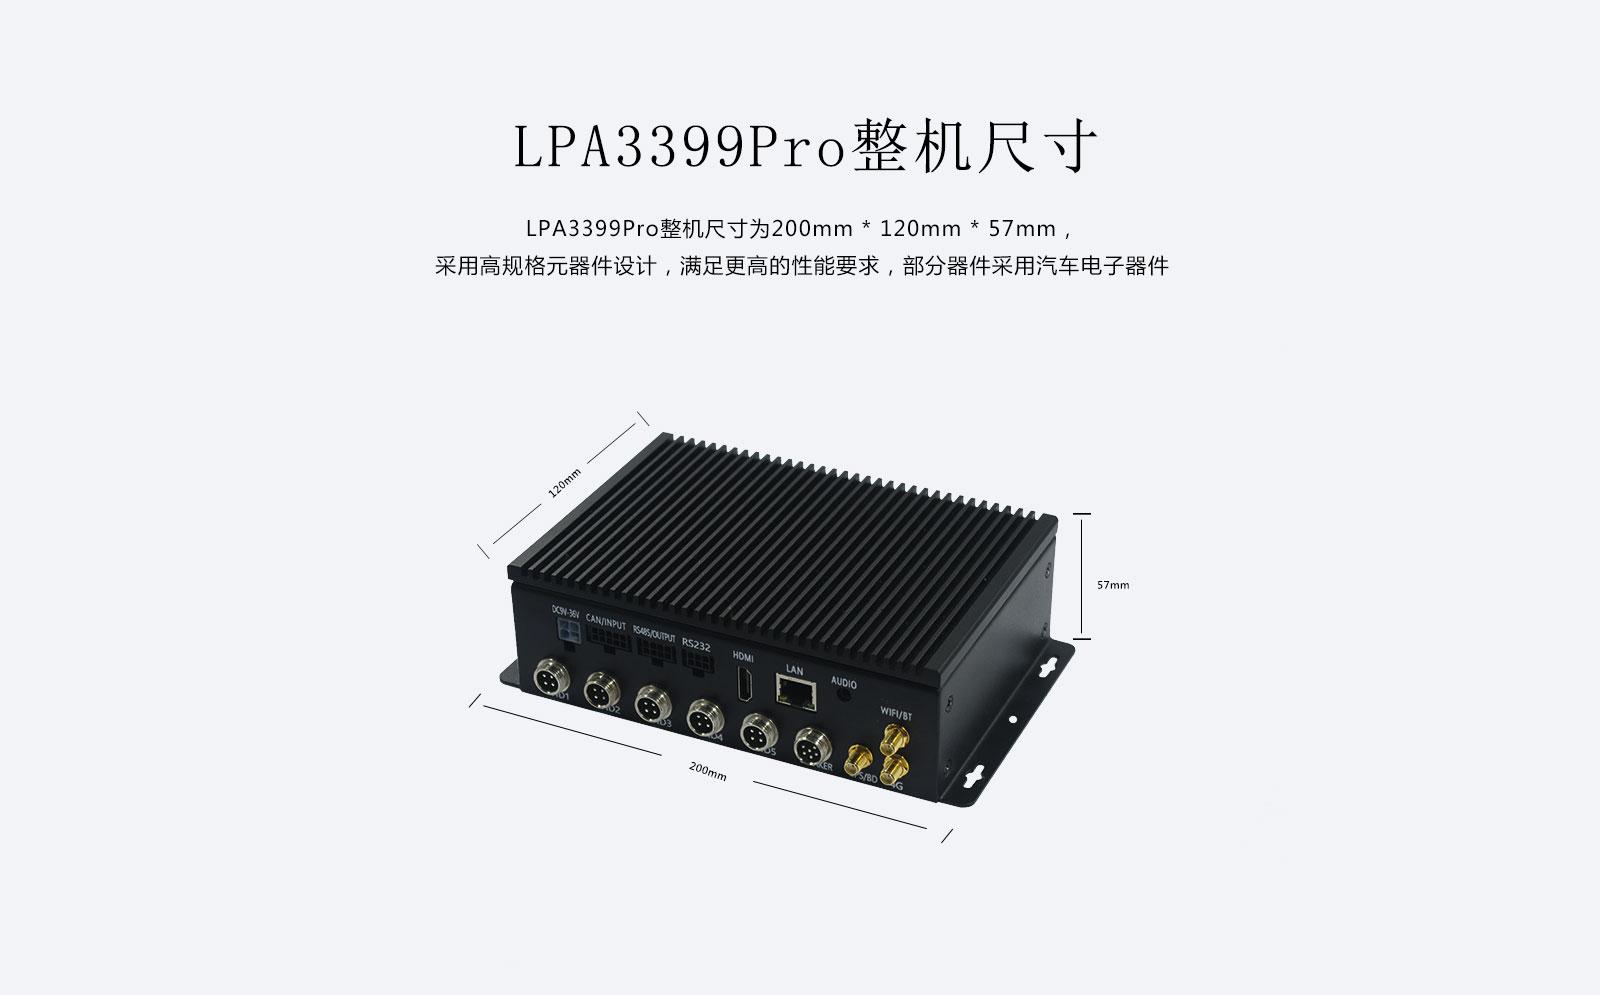 LPA3399PRO_01.jpg